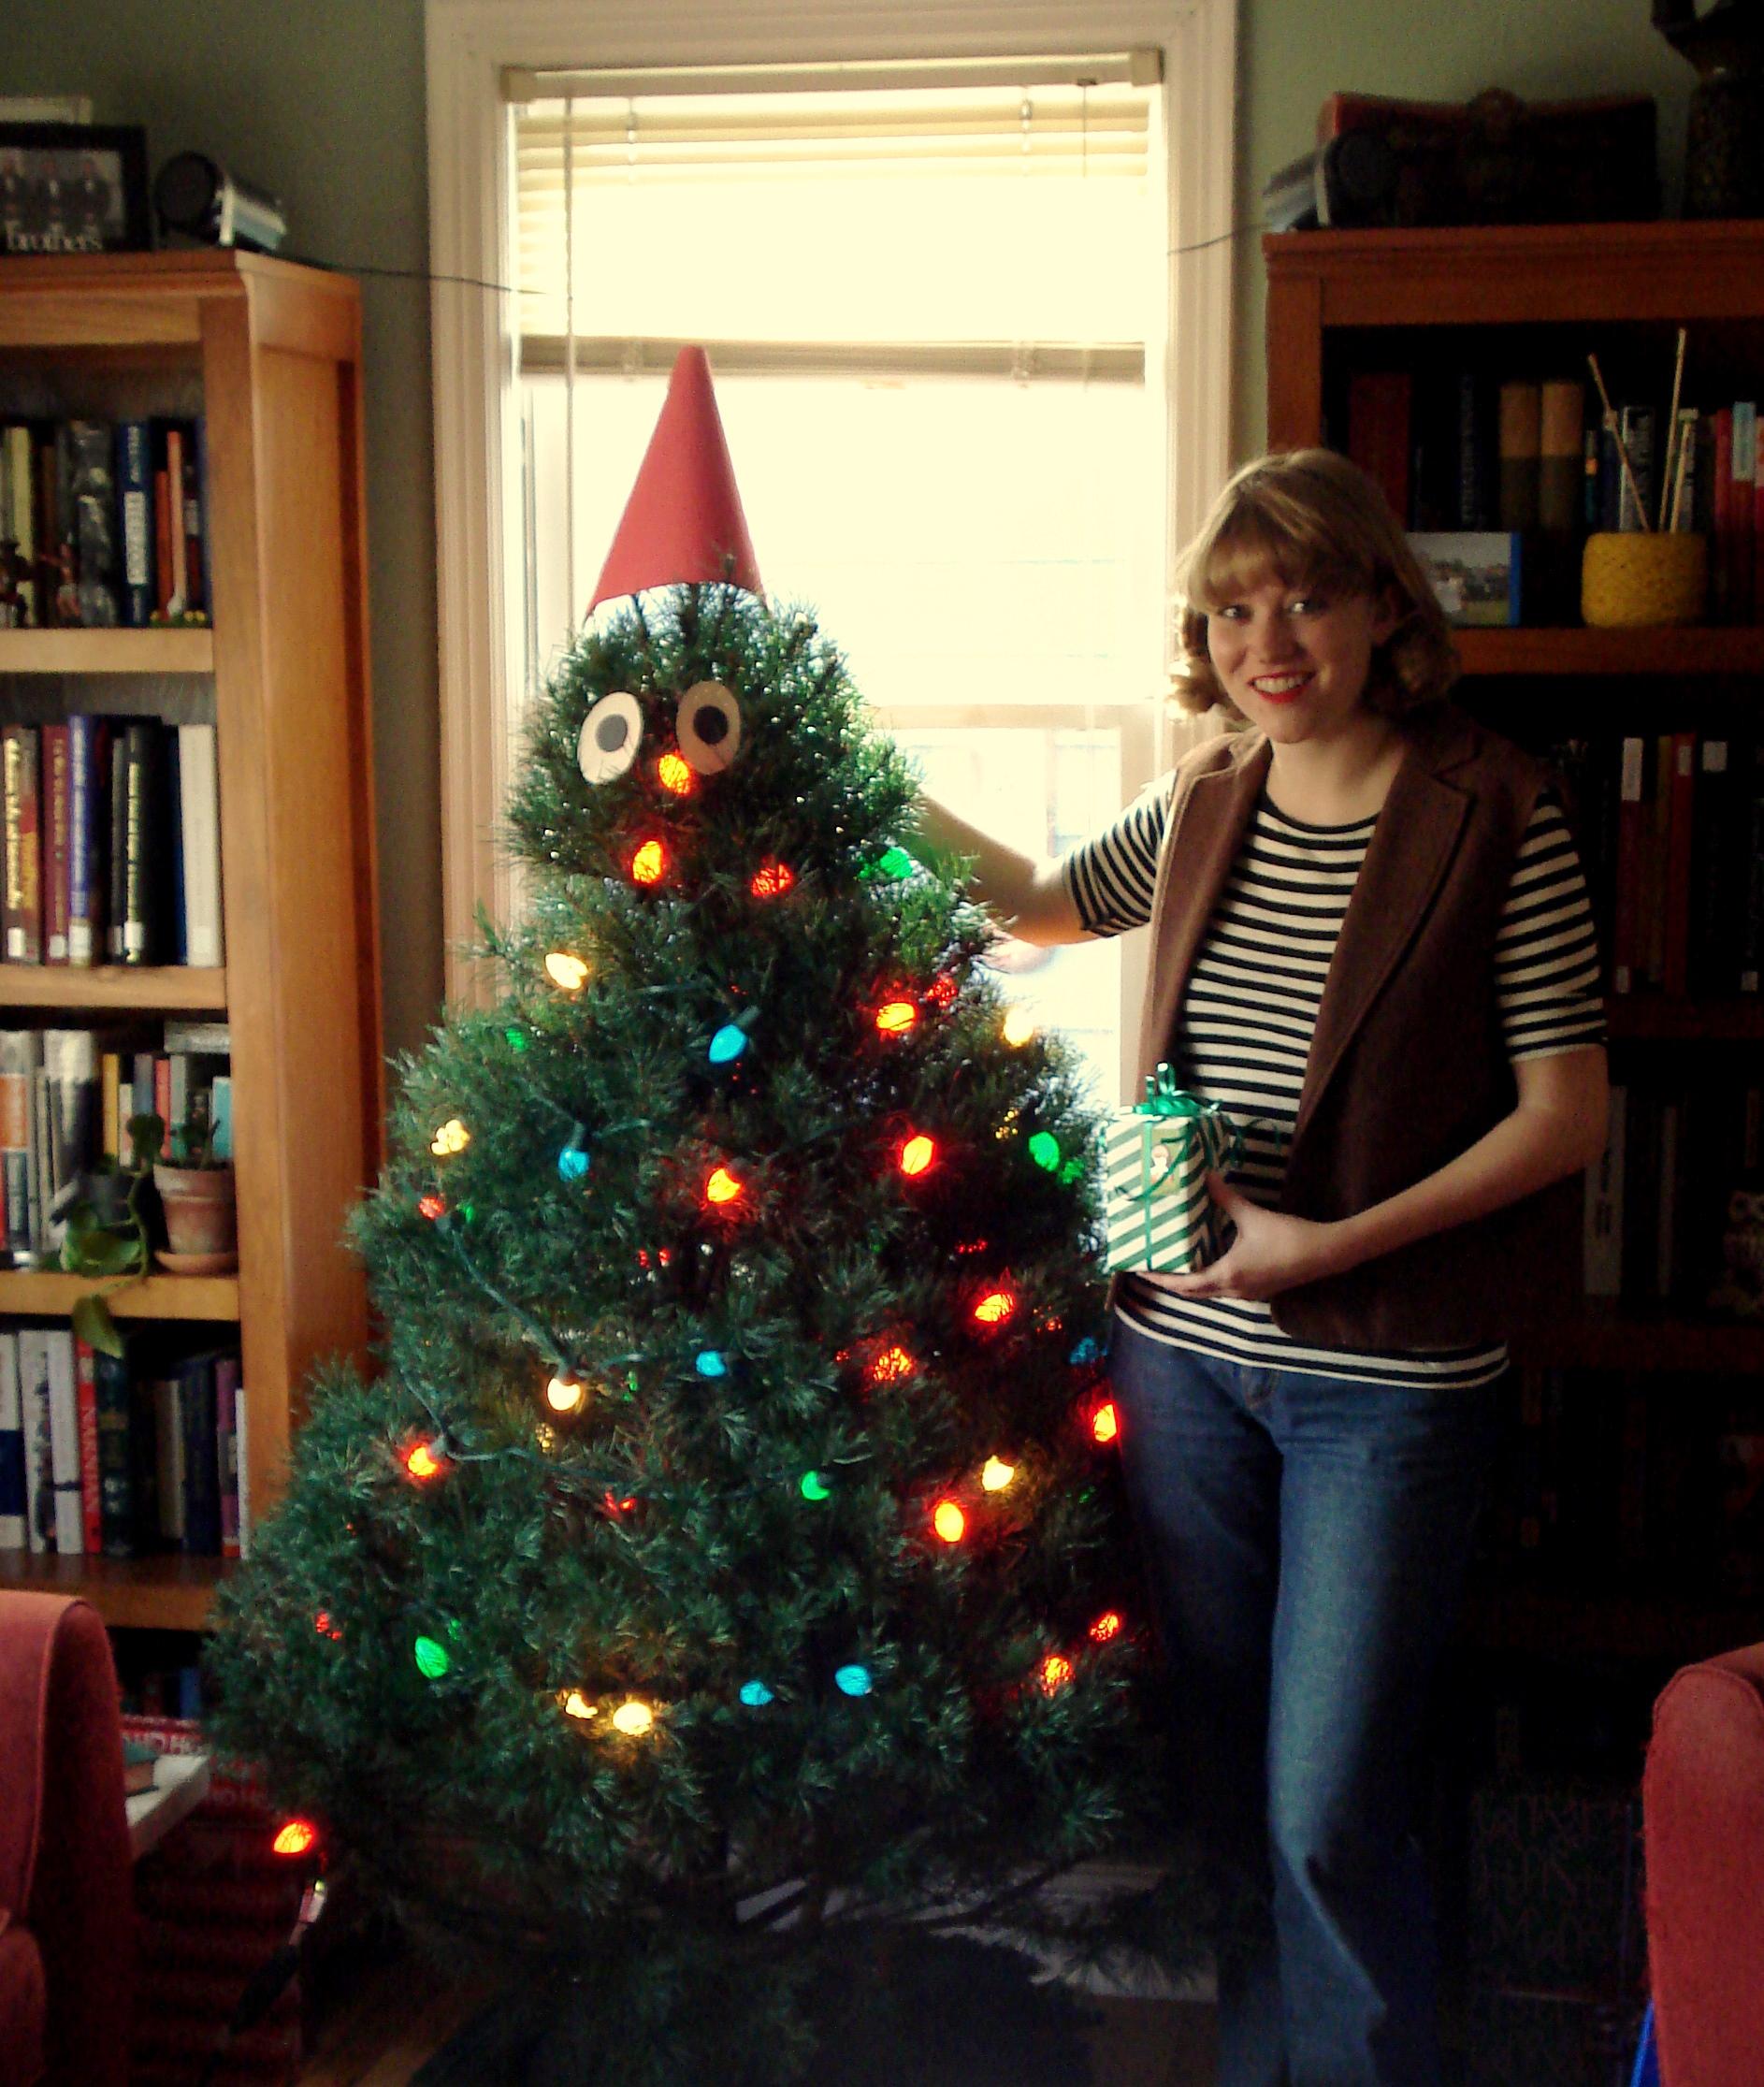 Gnome For The Holidays: A Christmas Tree Gnome |